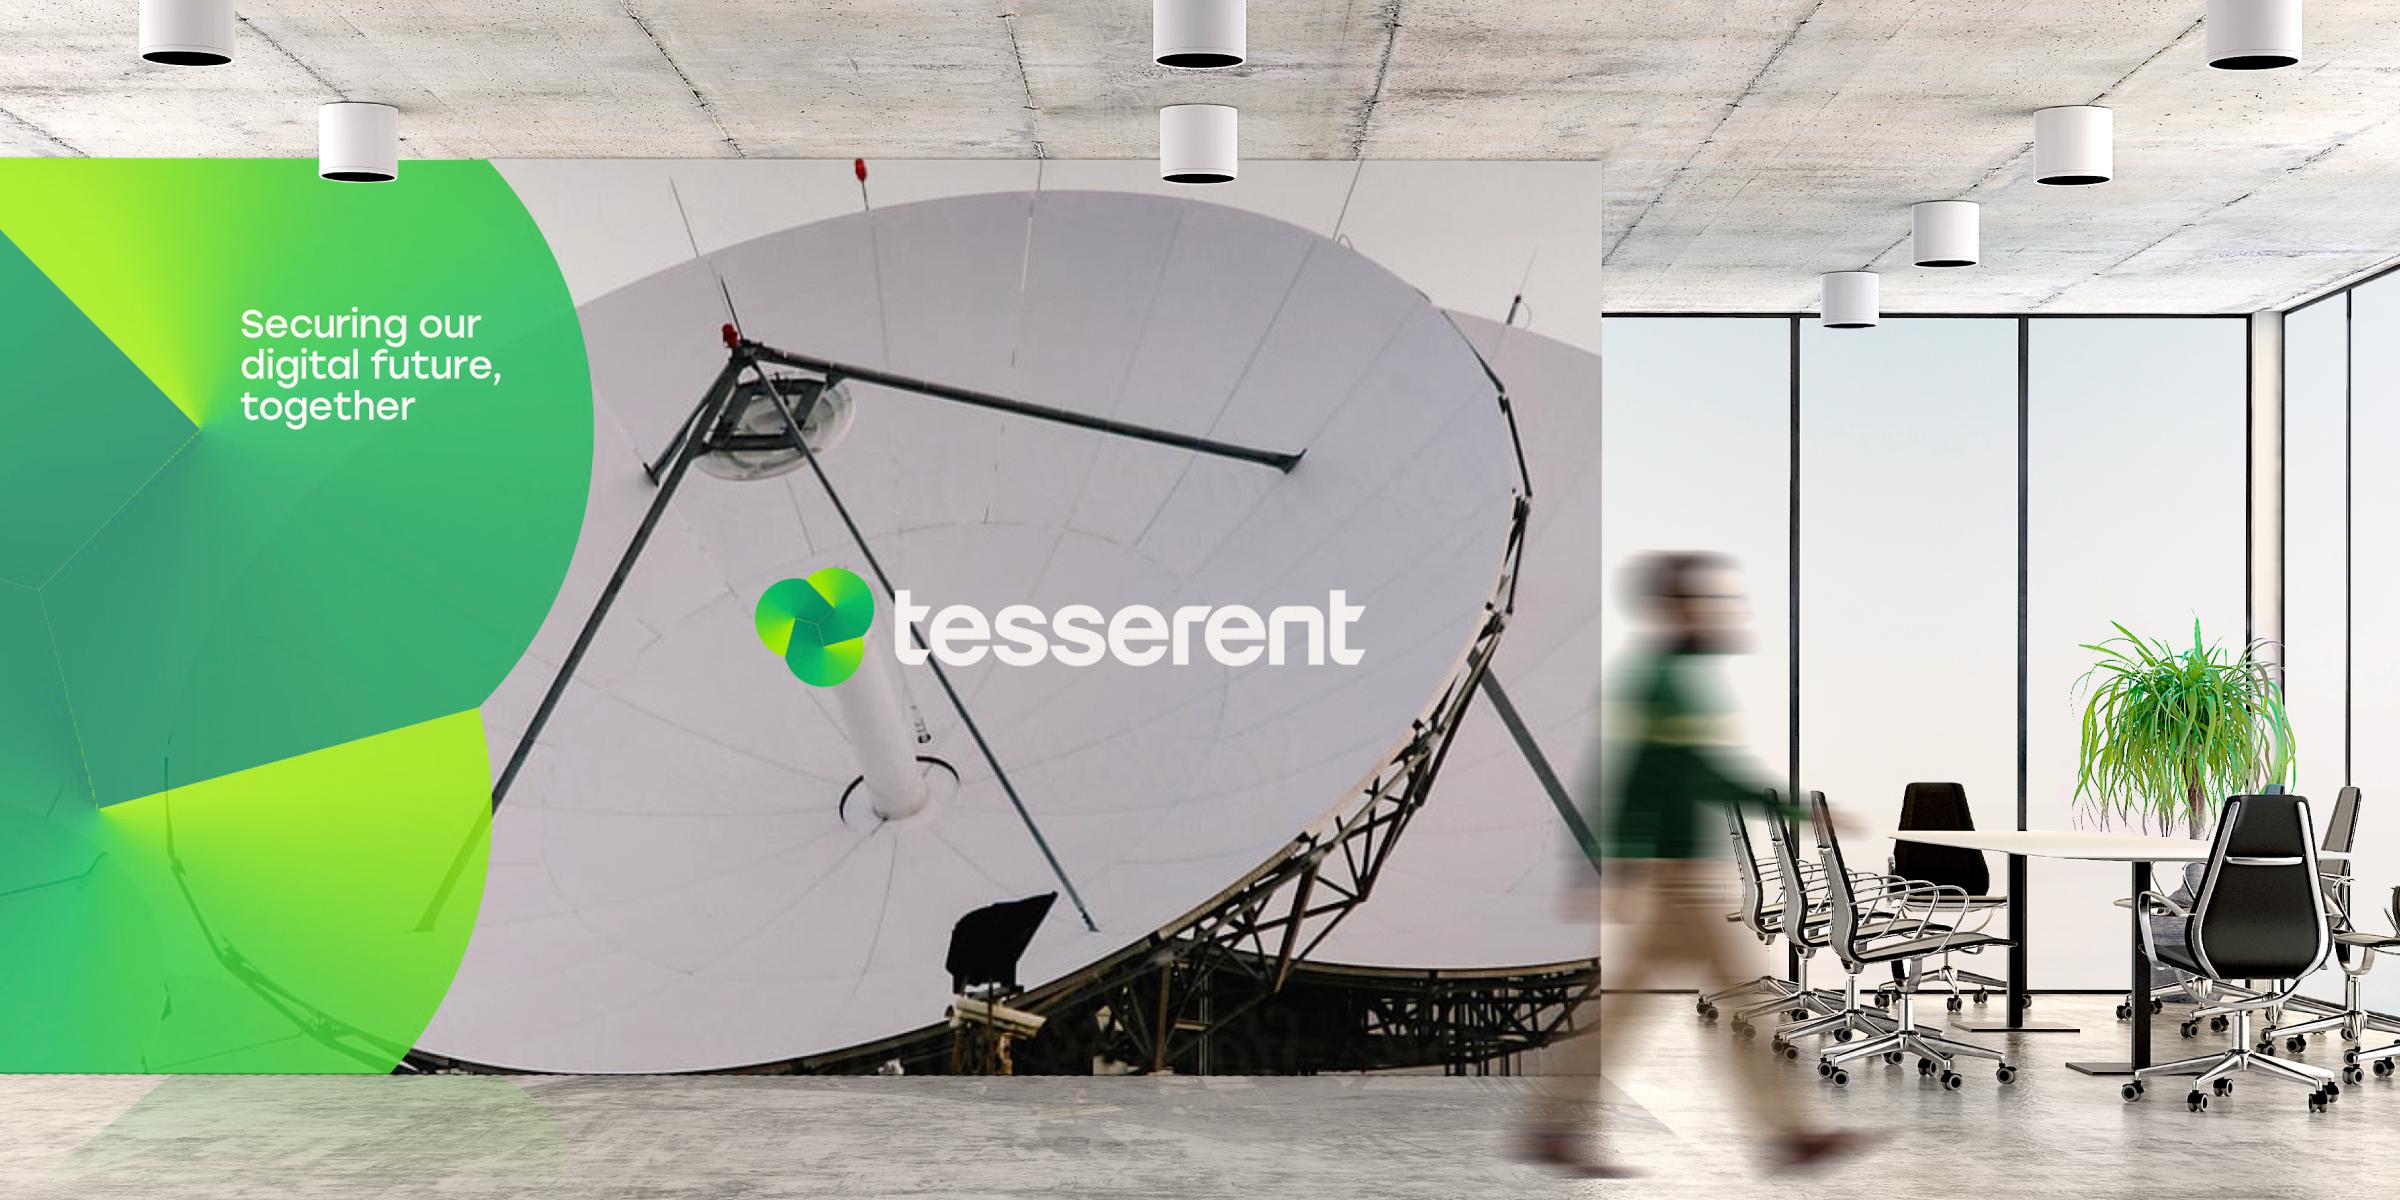 Tesserent Brand Identity Design Corporate Office Space